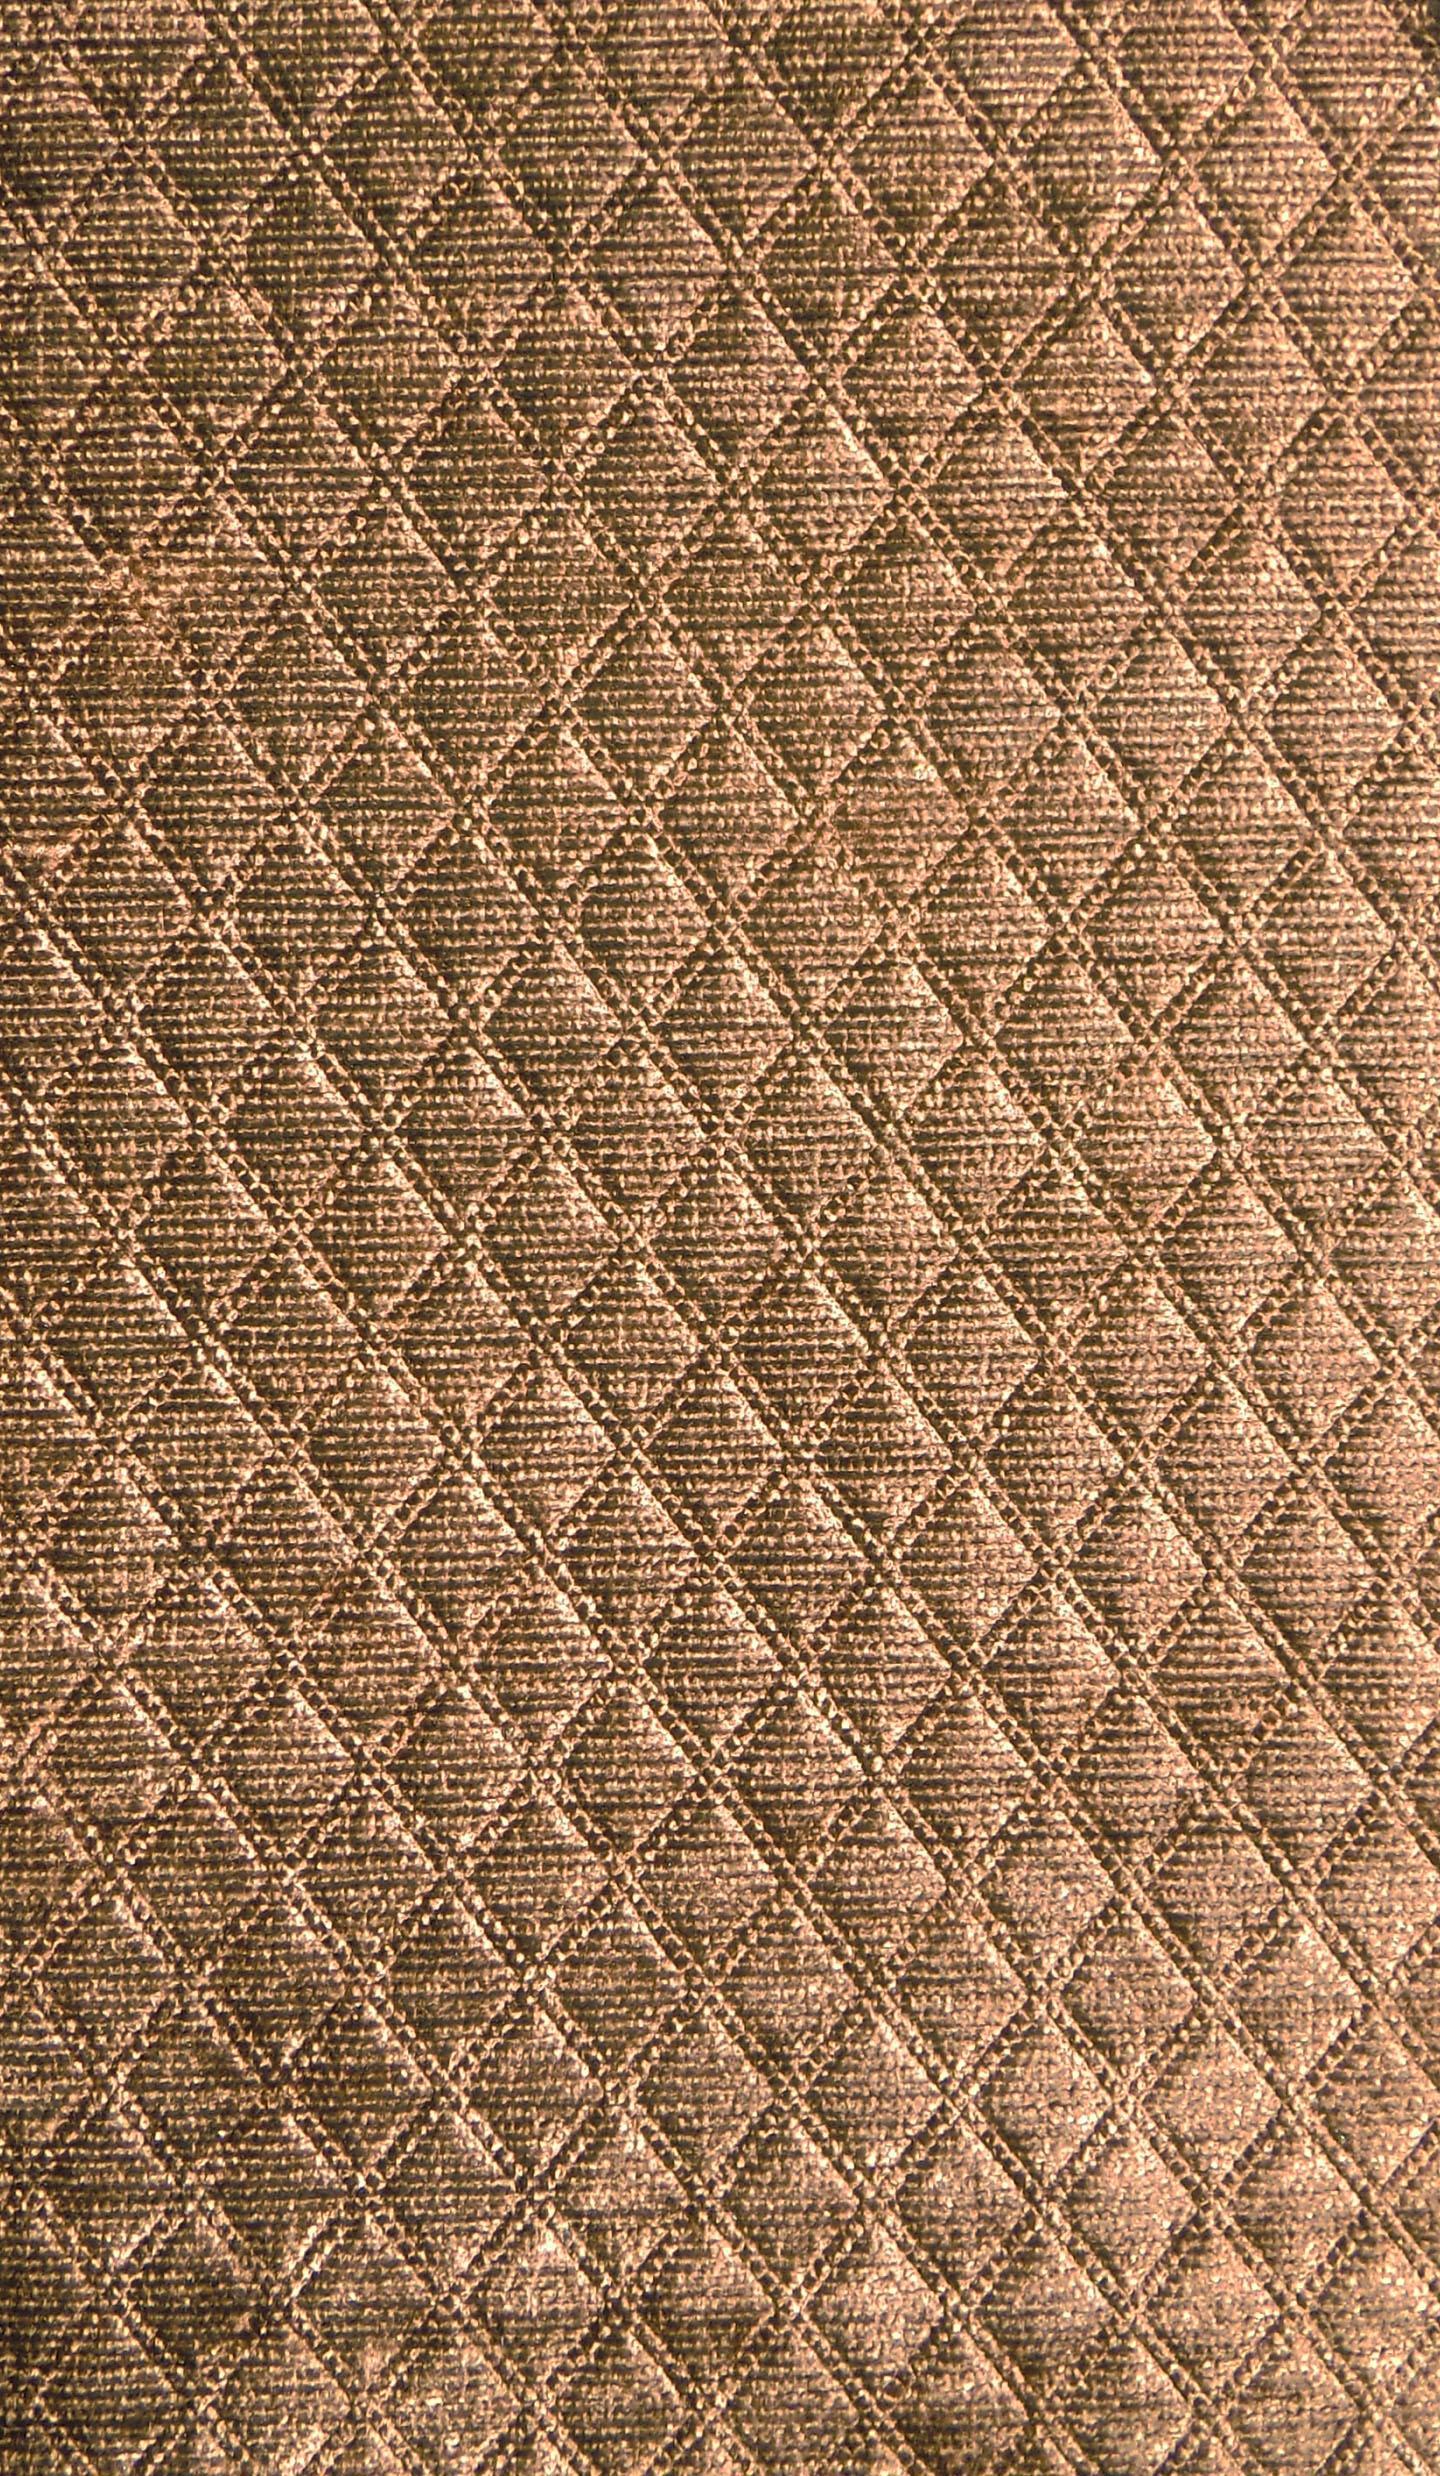 Rm Coco Fabrics Massachusetts Henna Interiordecorating Com